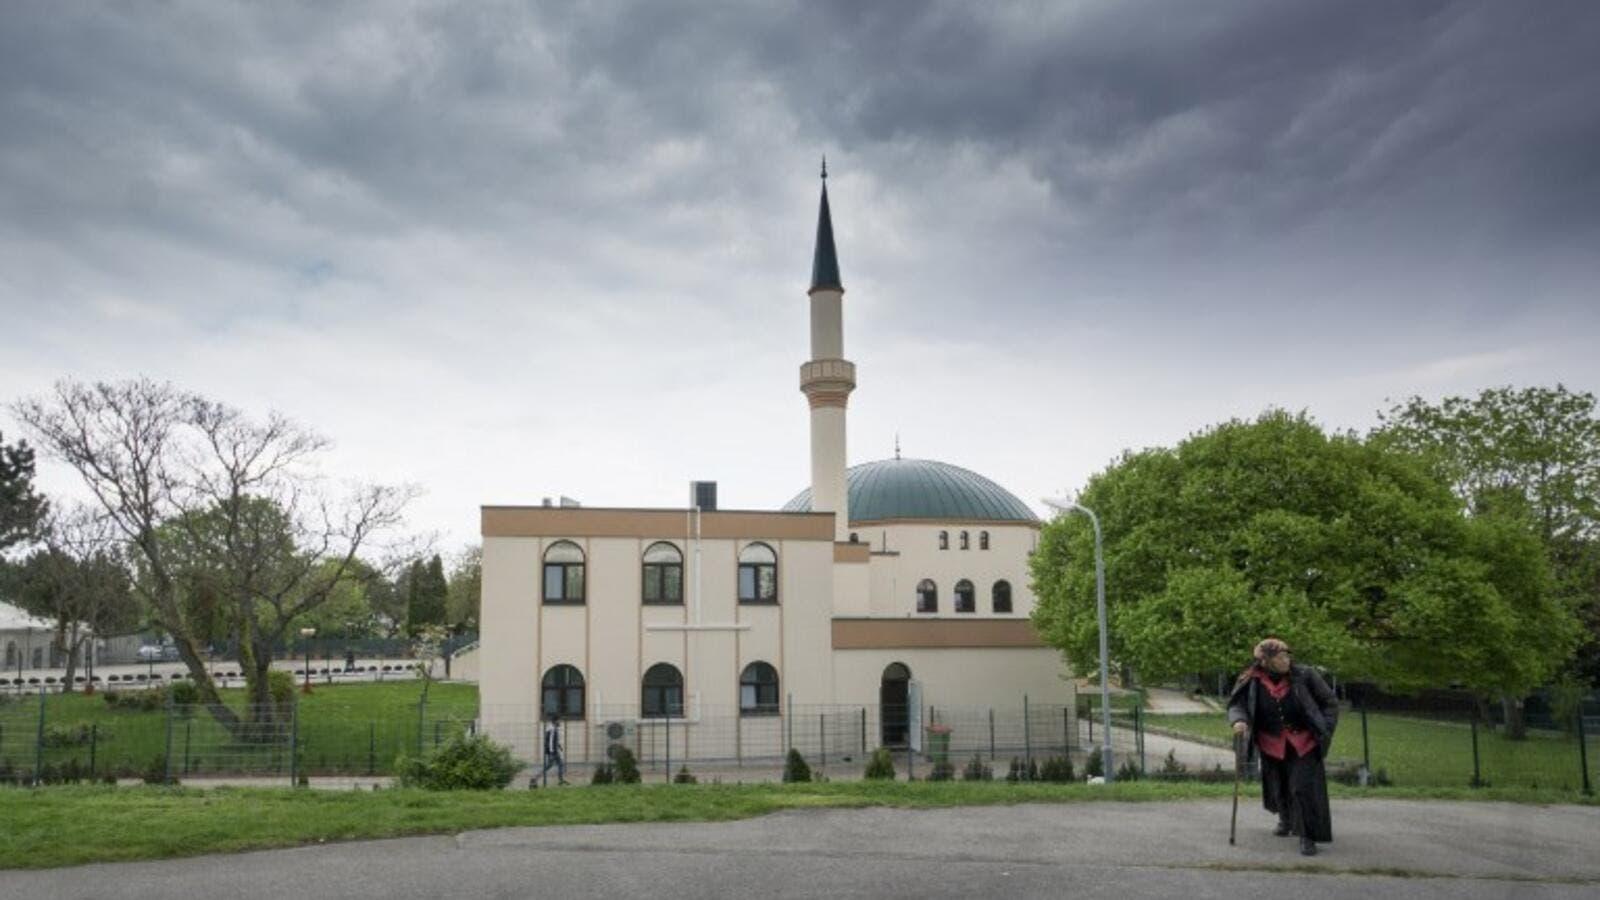 https://www.albawaba.com/sites/default/files/styles/de2e_standard/public/im/EU_2017/Austria_Mosque_AFP.jpg?itok=ifbpM6QG